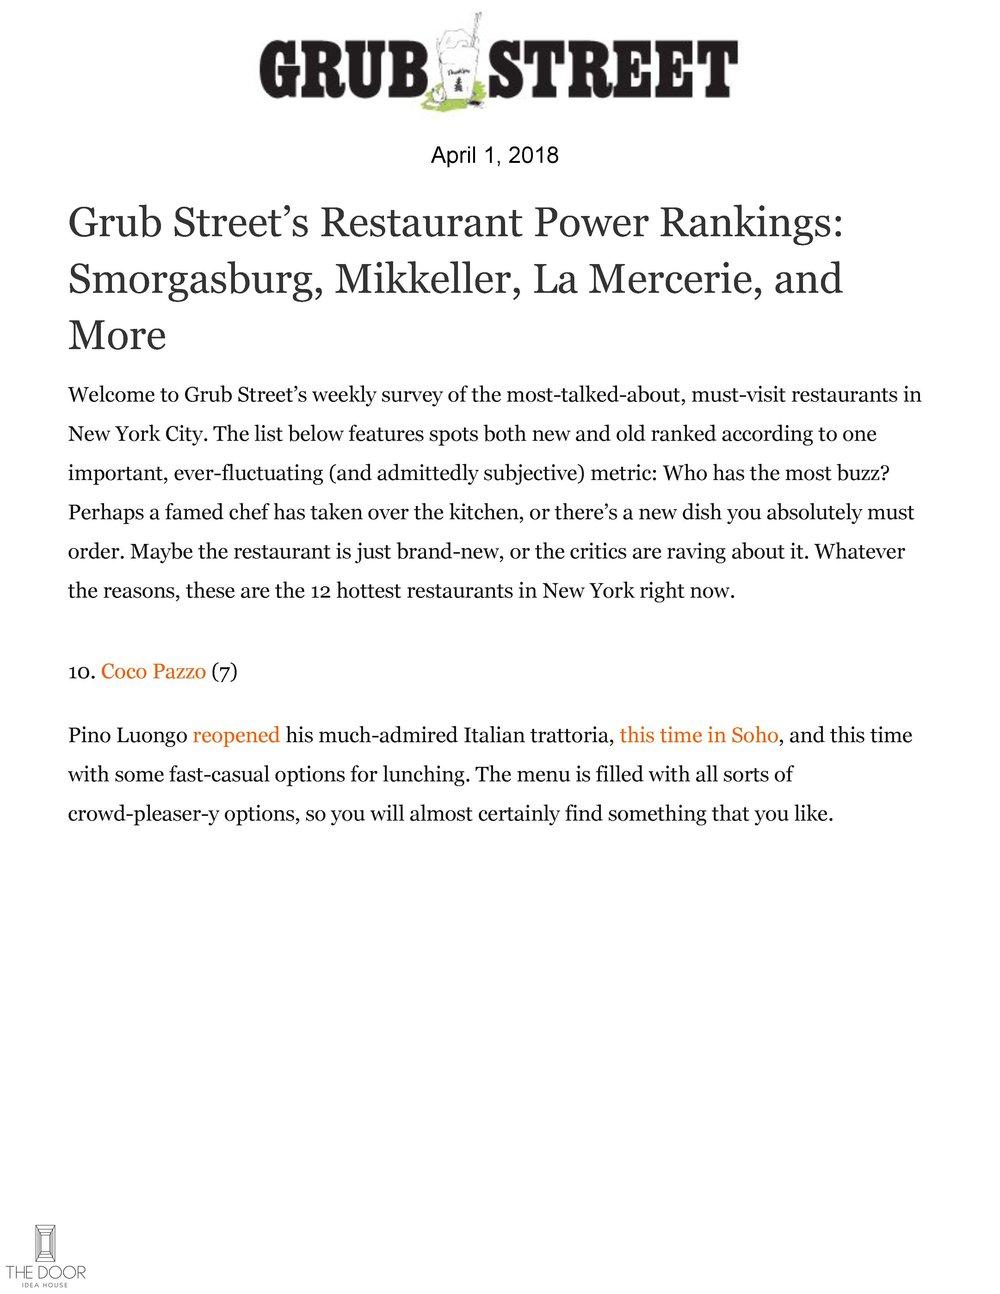 GrubStreet_CP_4_1.jpg